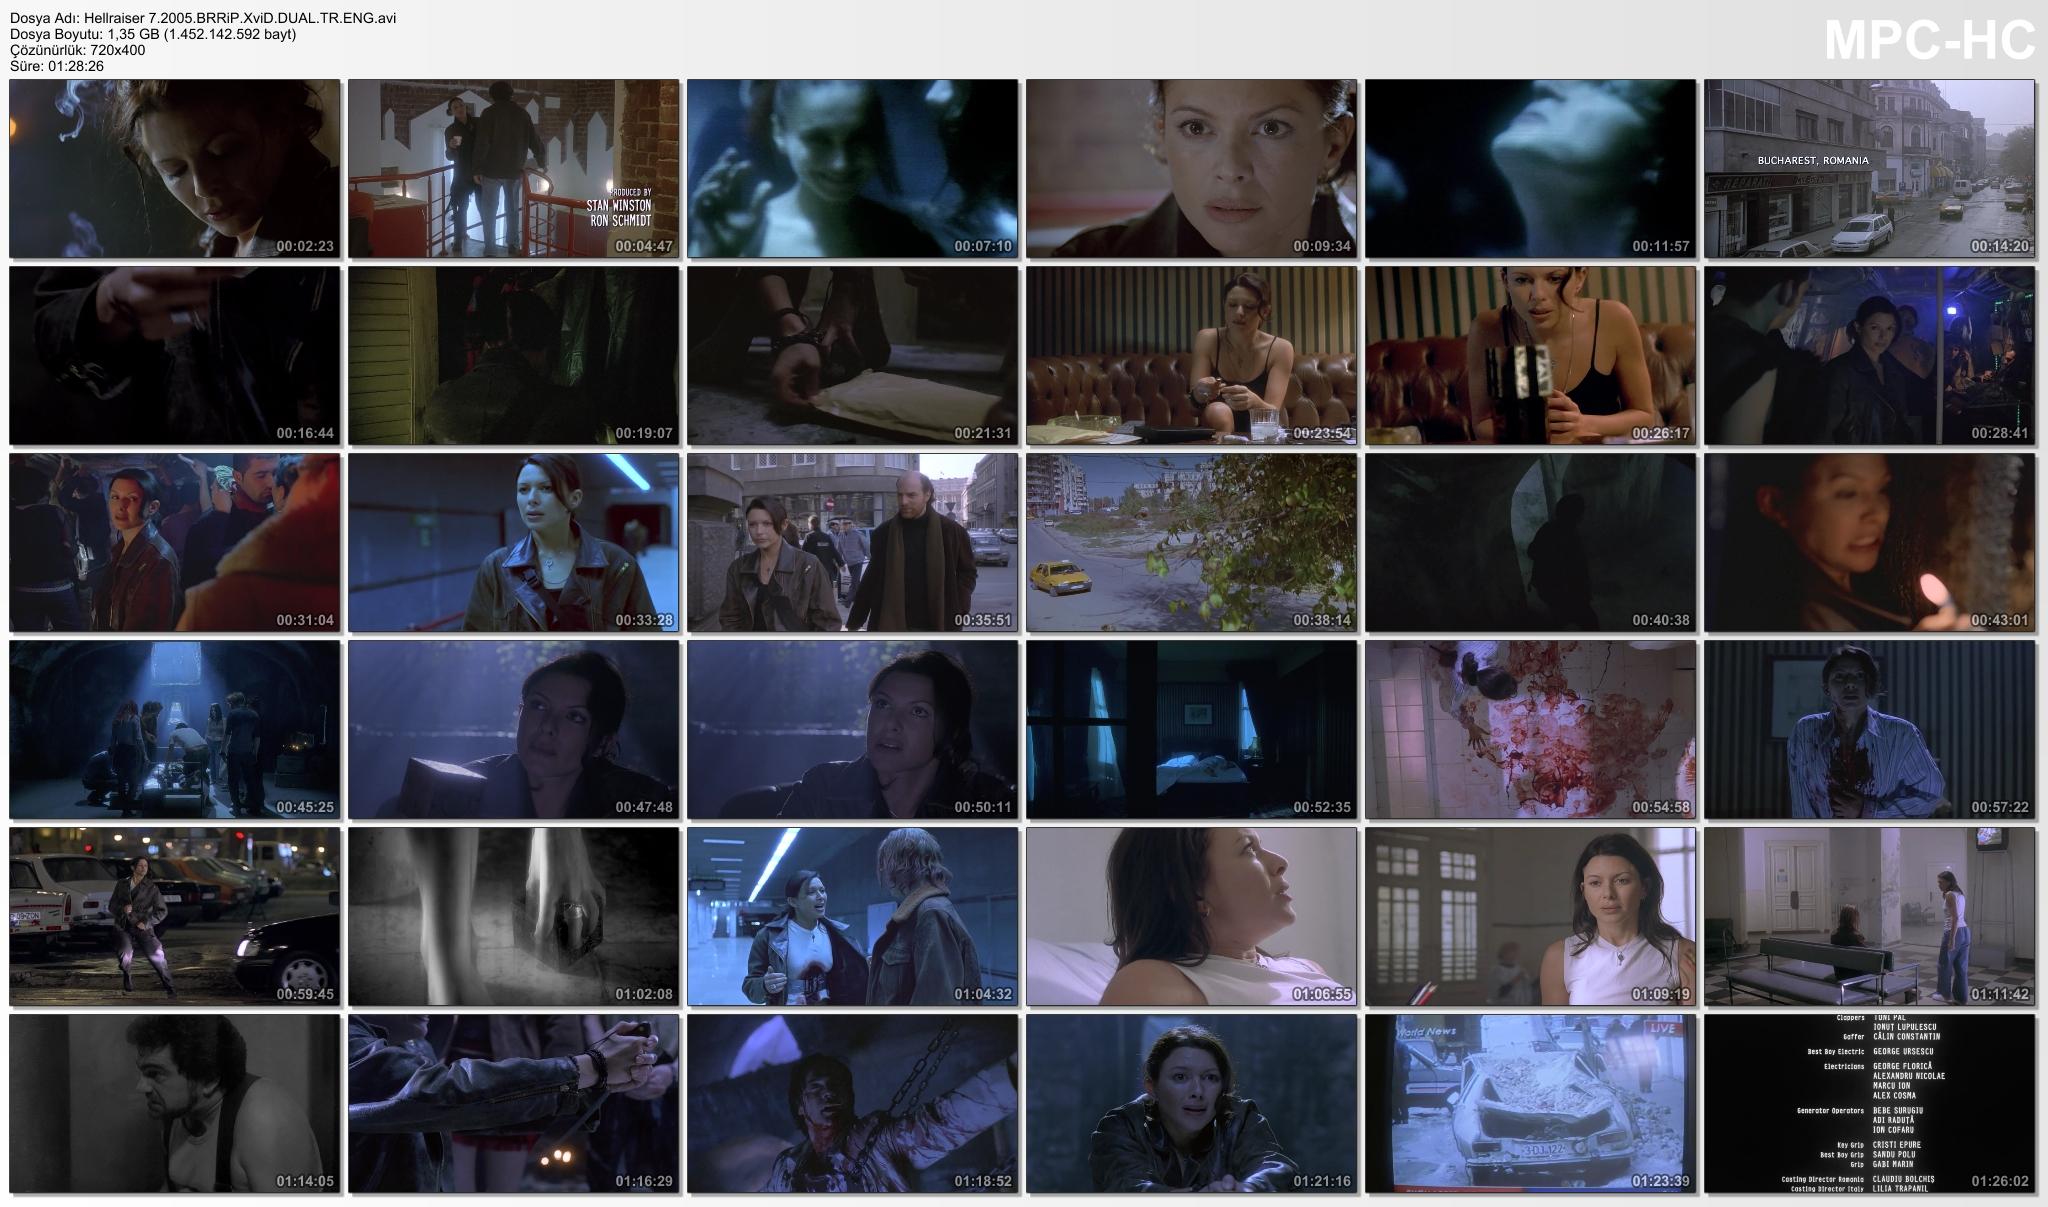 Hellraiser 7.2005.BRRiP.XviD.DUAL.TR.ENG.avi_thumbs_[2019.12.03_18.13.04]